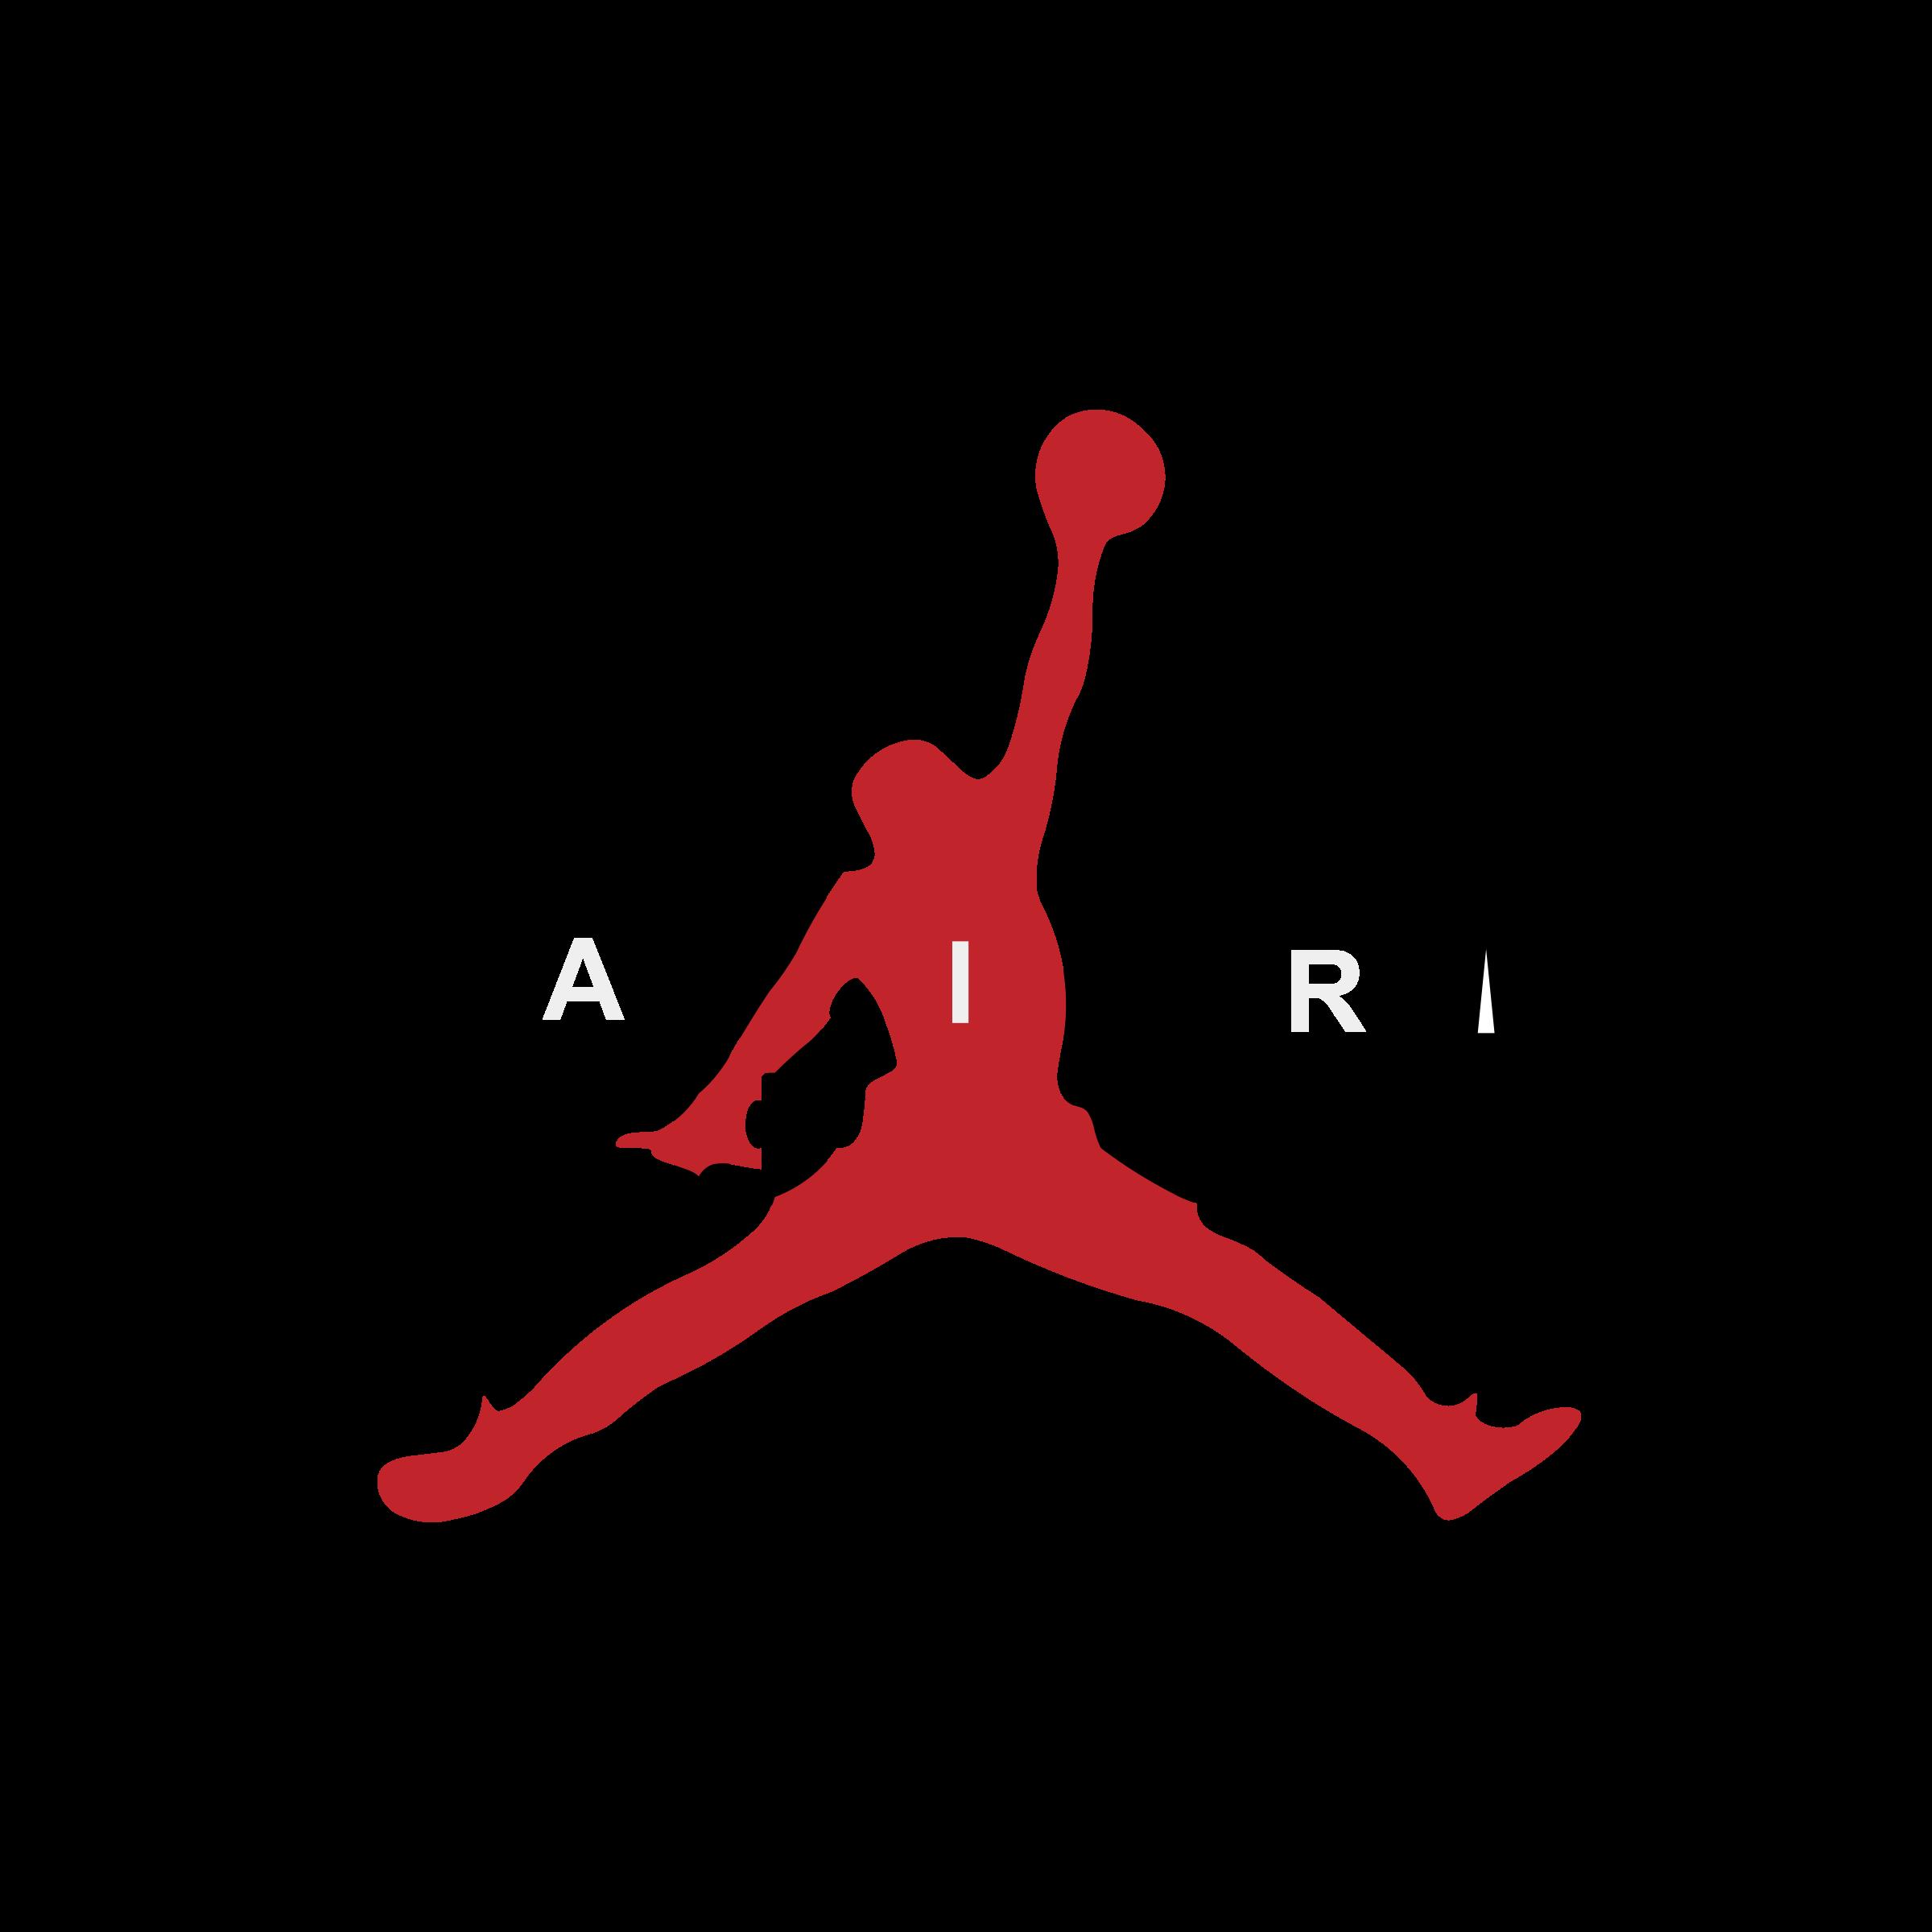 Nike Air Logo Svg - fondo de pantalla tumblr - Nike Shoes Logo